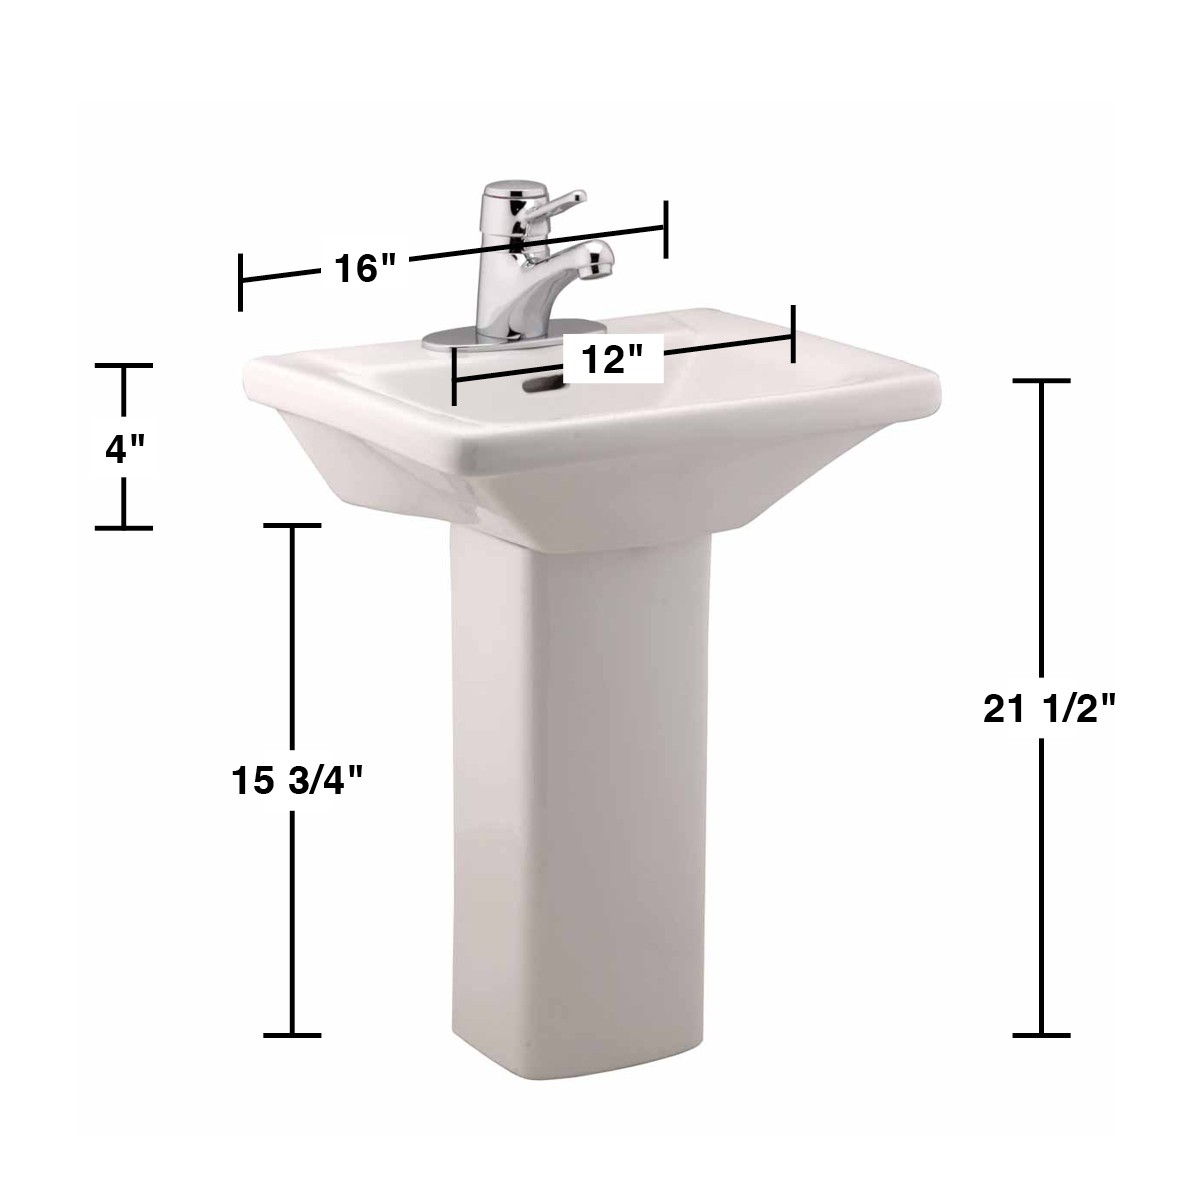 Spec U003cPREu003e2 Childrenu0027s White Pedestal Sinks Vitreous China Set ...